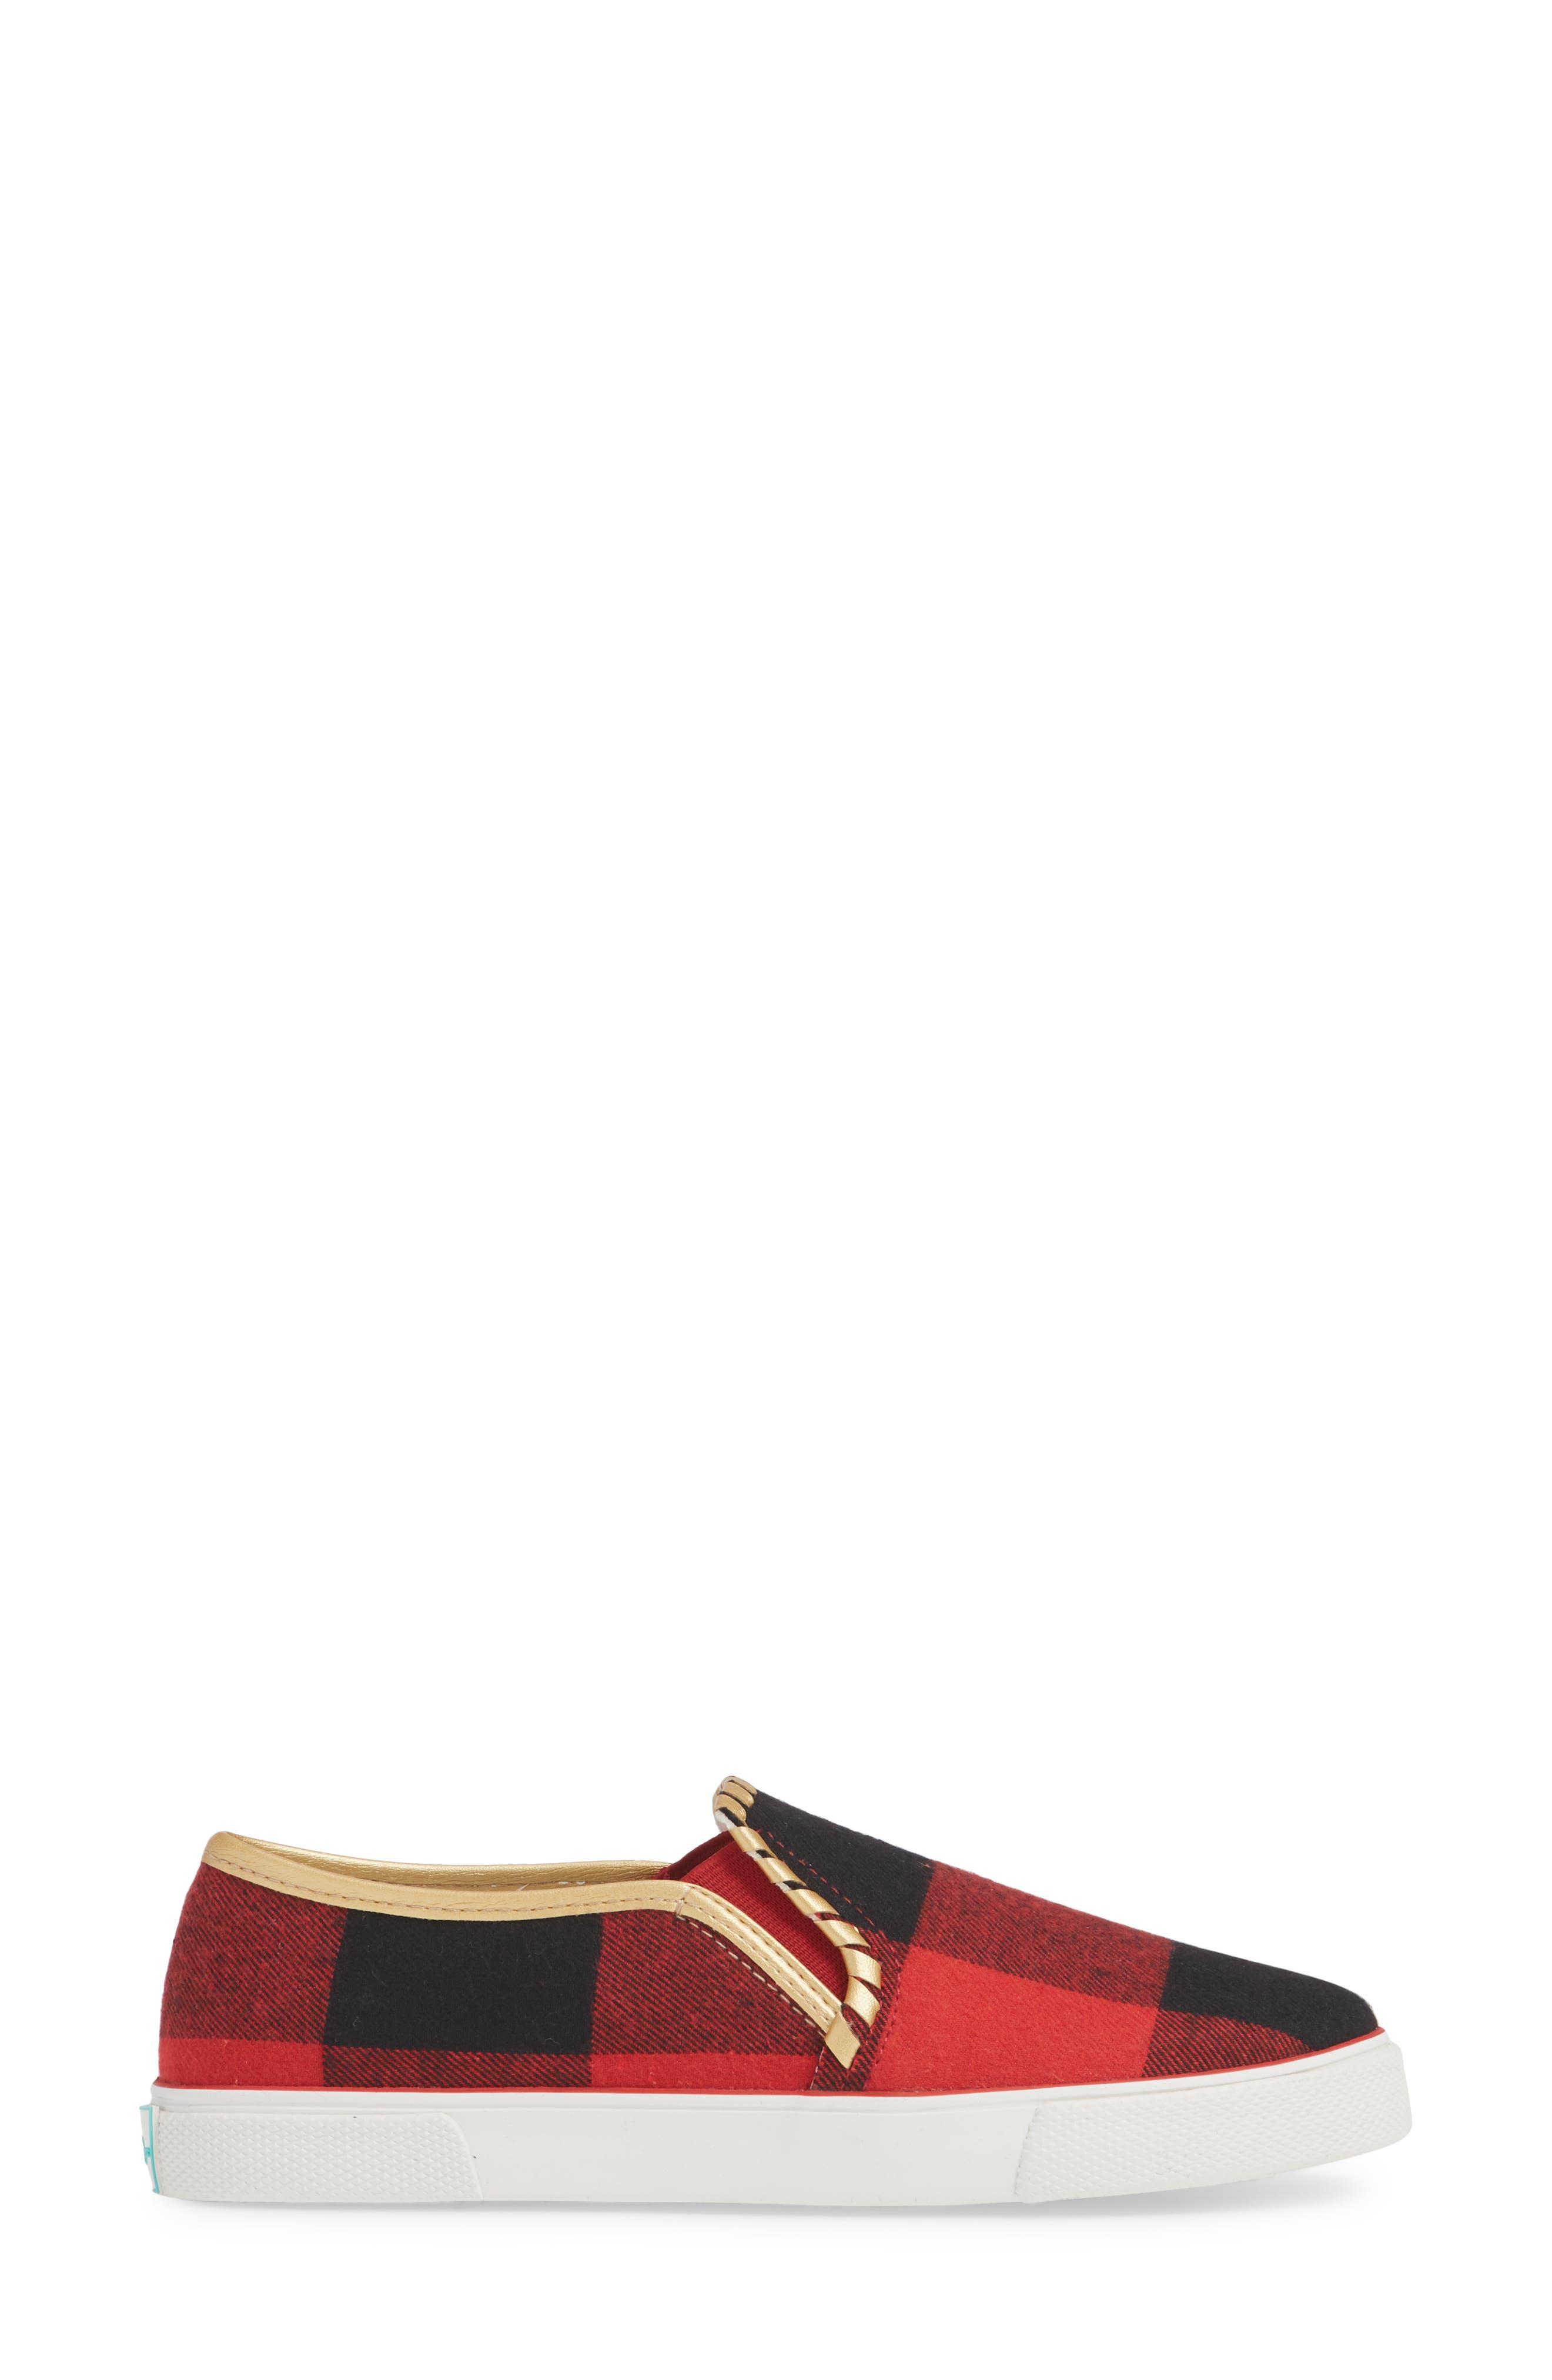 Brynne Slip-On Sneaker,                             Alternate thumbnail 3, color,                             RED/ BLACK FABRIC